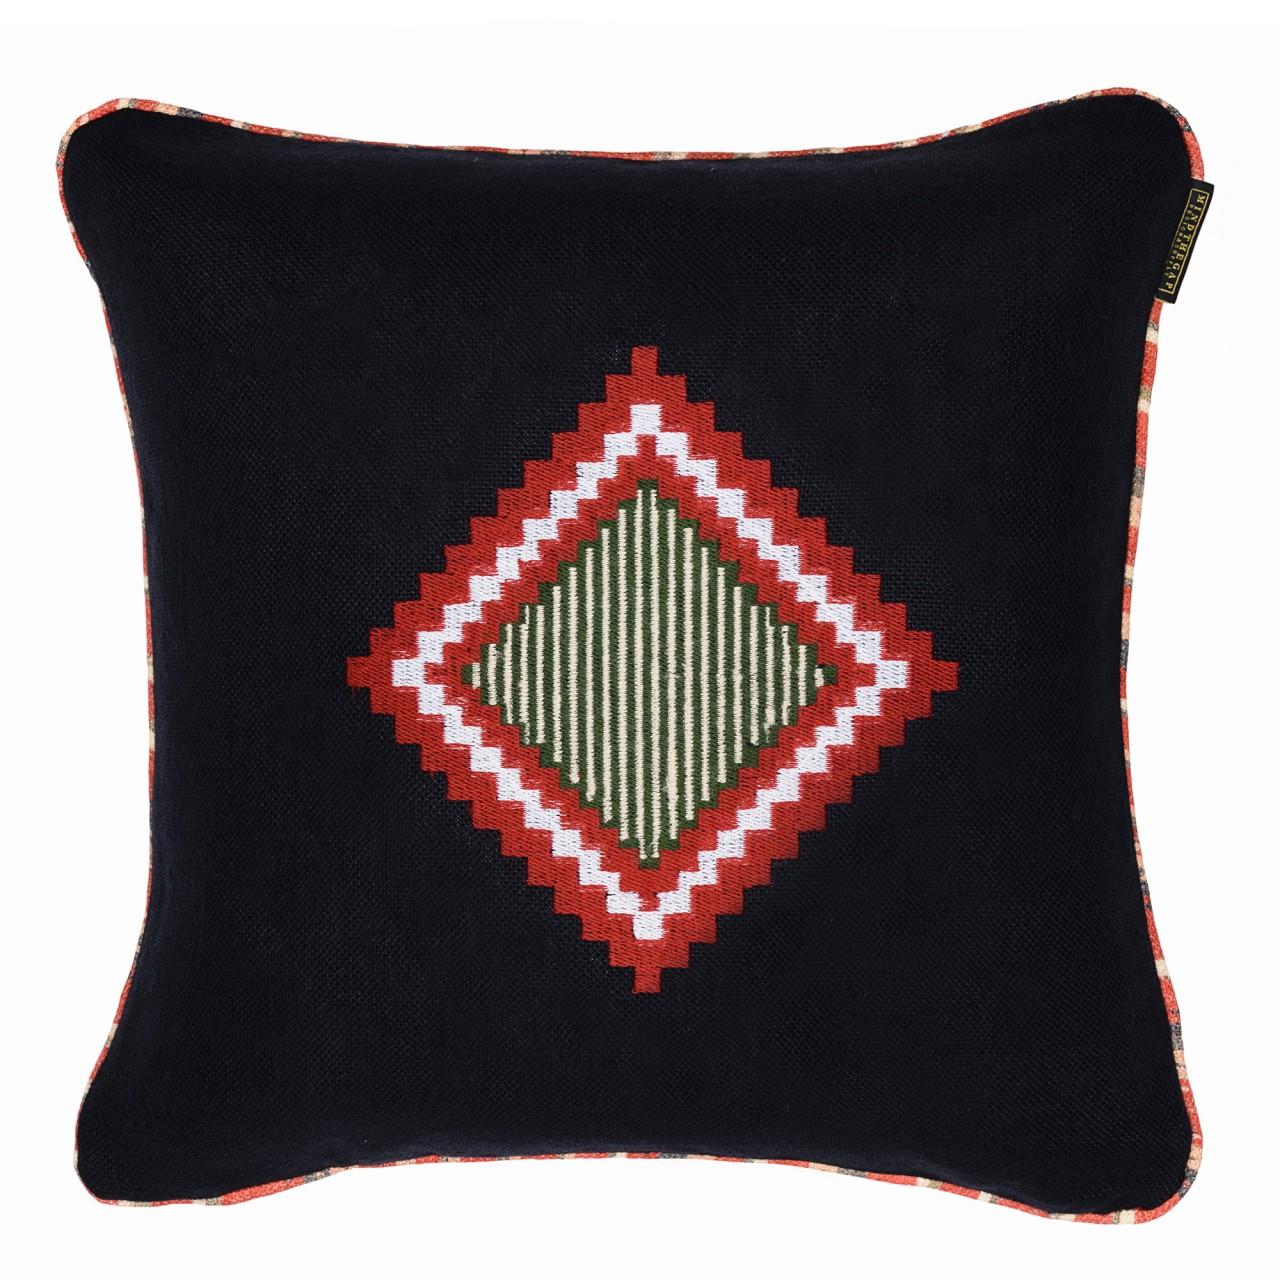 MOKI Linen Embroidered Cushion